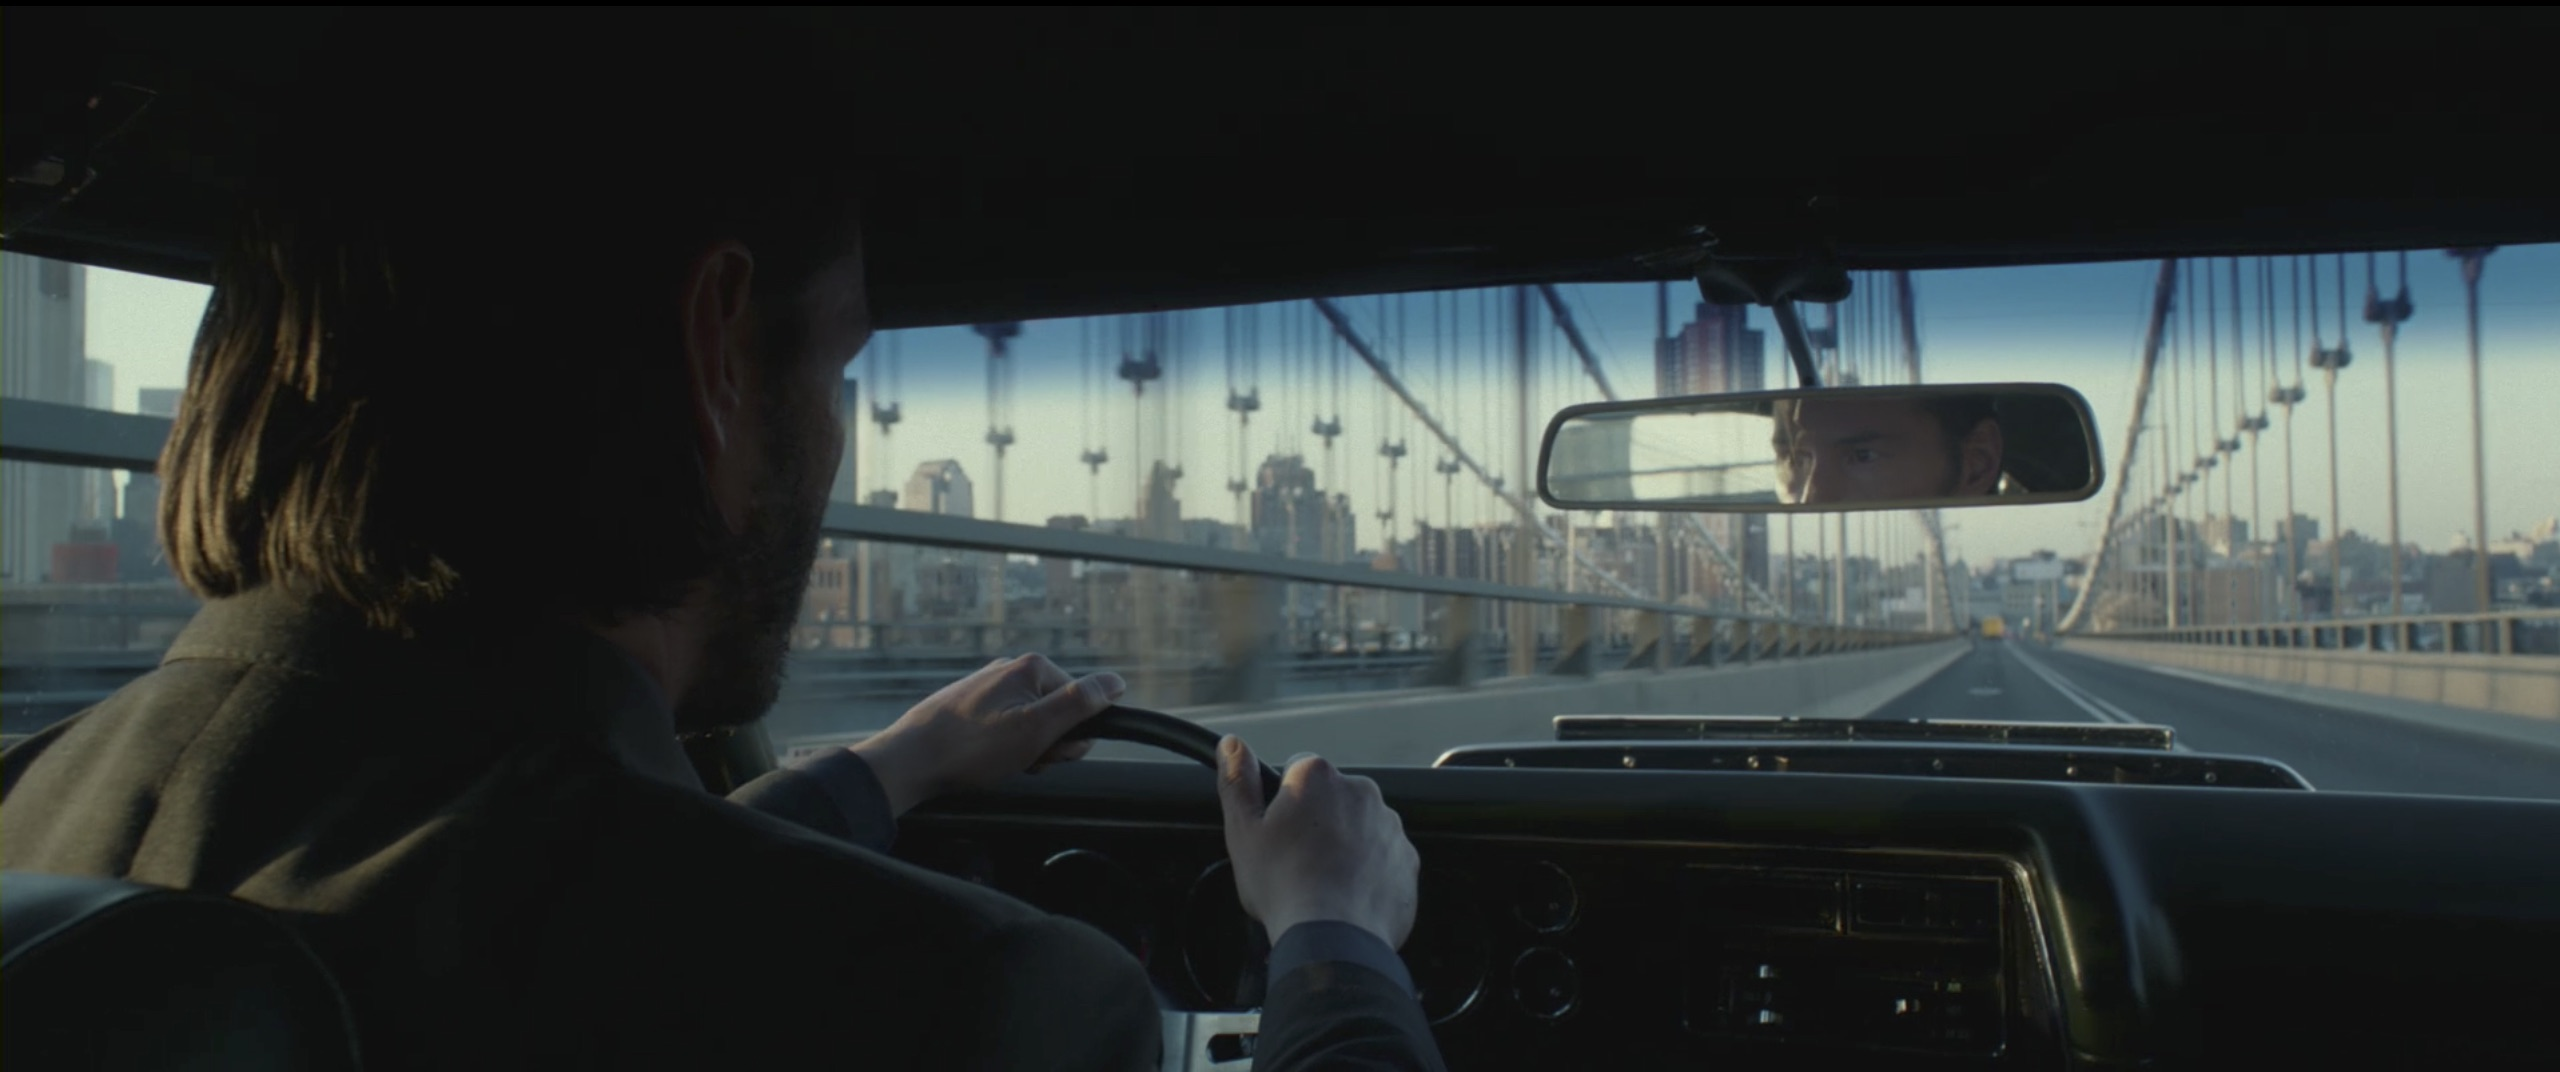 John Wick driving